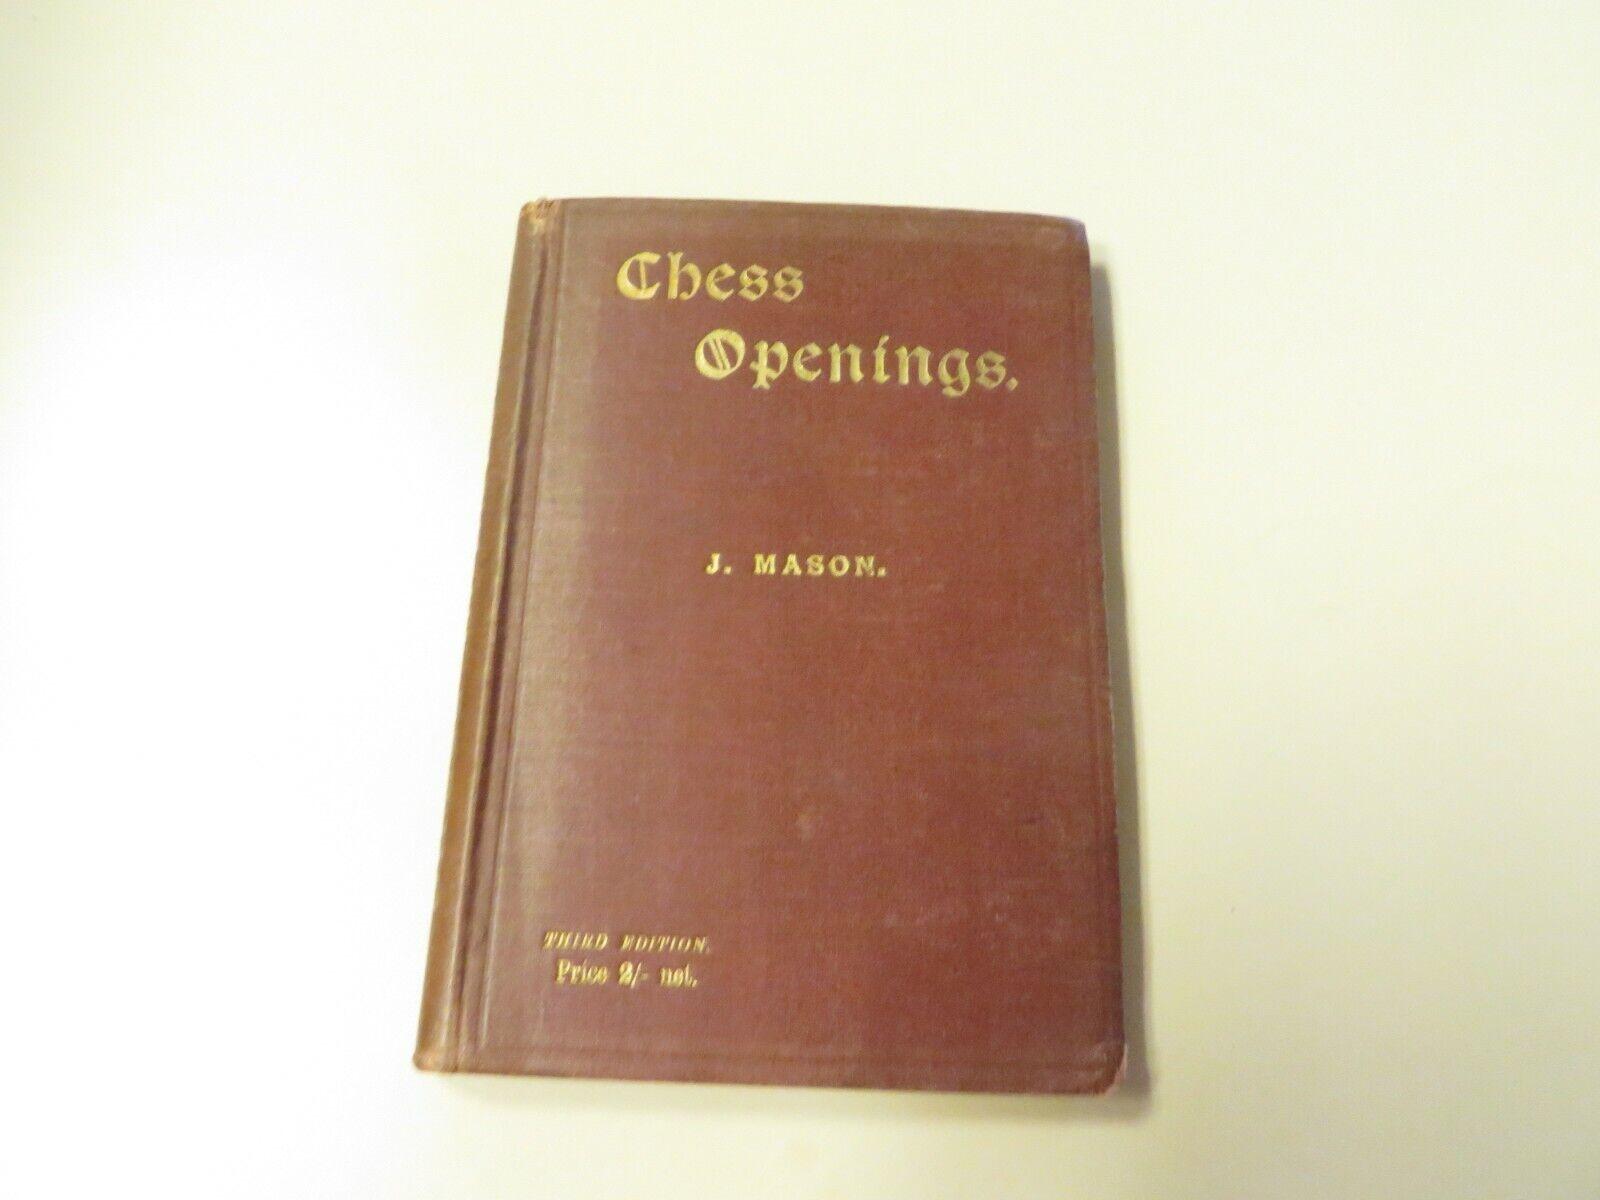 Vintage Allan Troy Chess book-Chess  Openings, par James Mason  site officiel